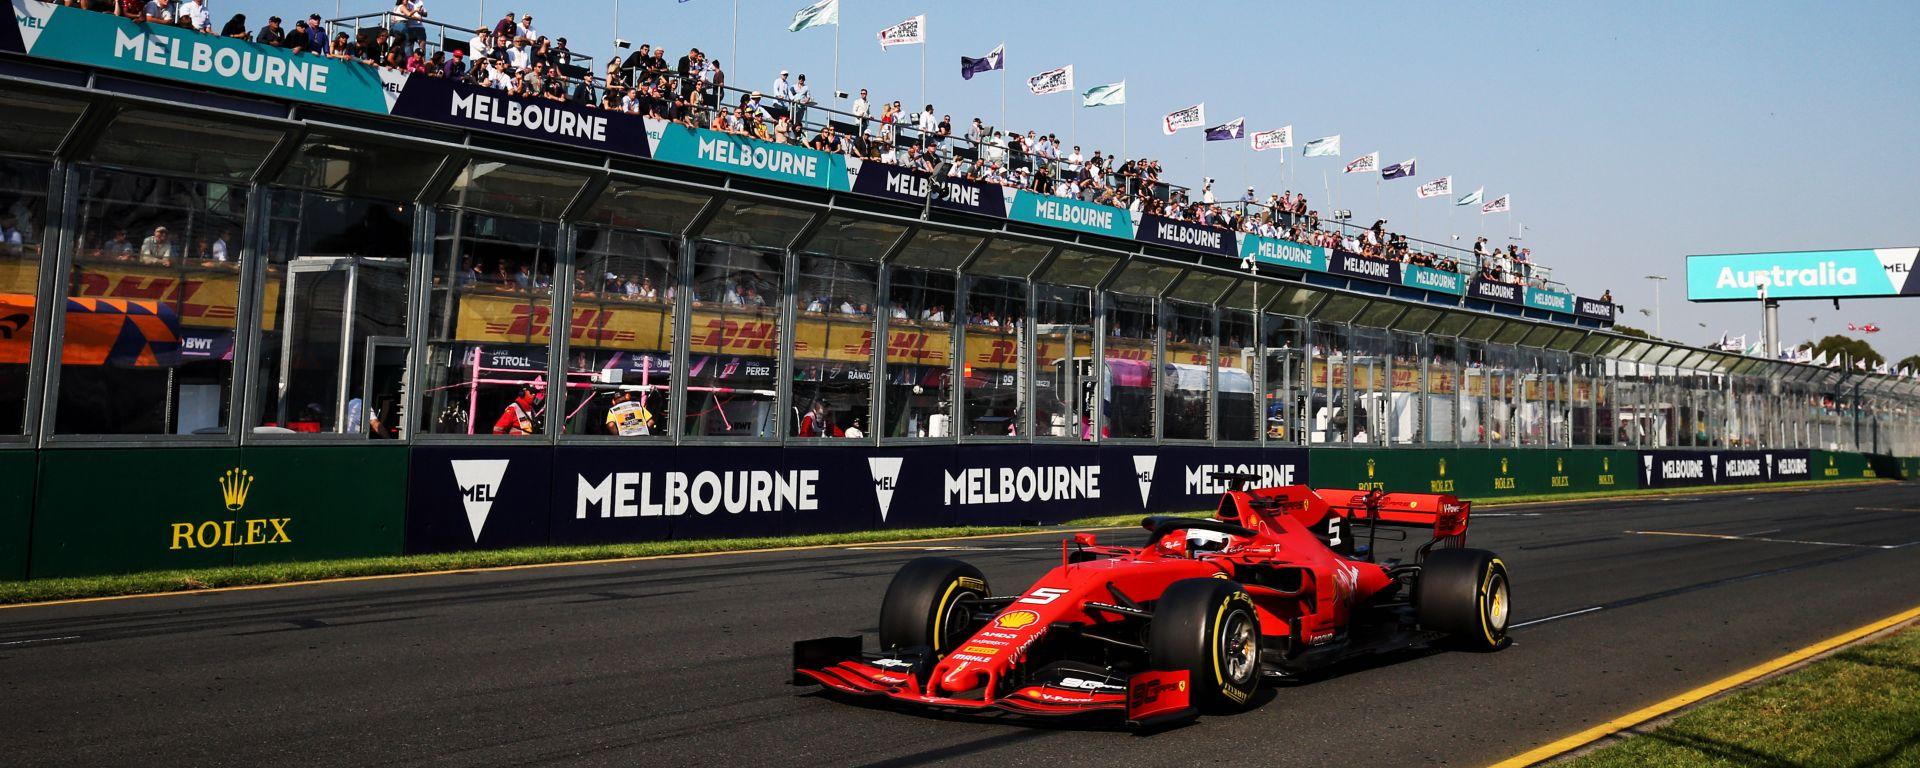 GP Australia 2019, Melbourne: Sebastian Vettel (Ferrari)